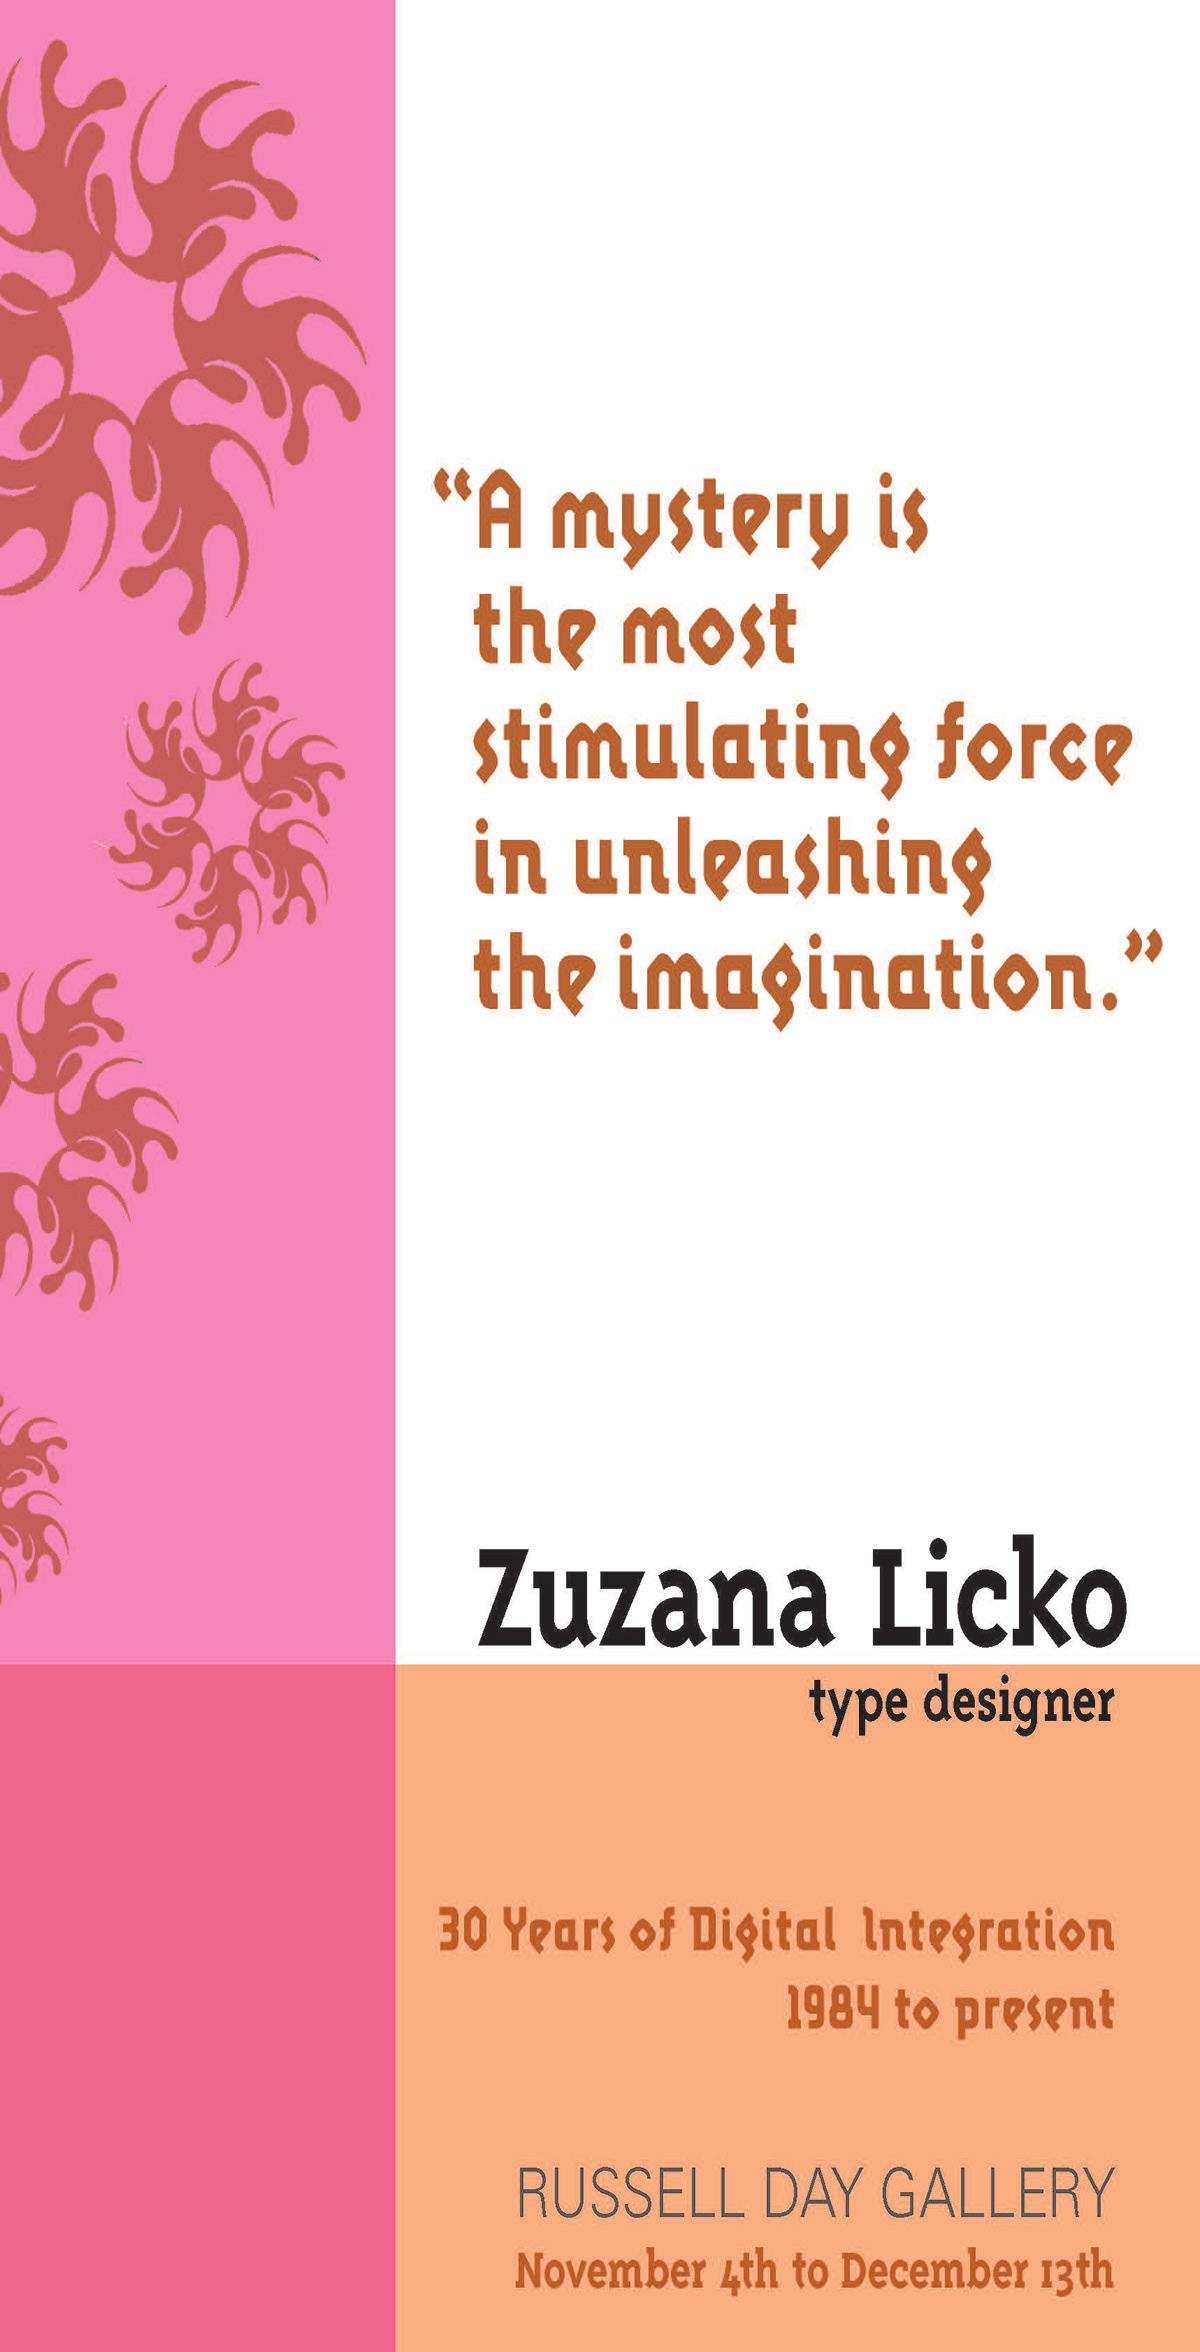 Zuzana Licko Booklet on AIGA Member Gallery